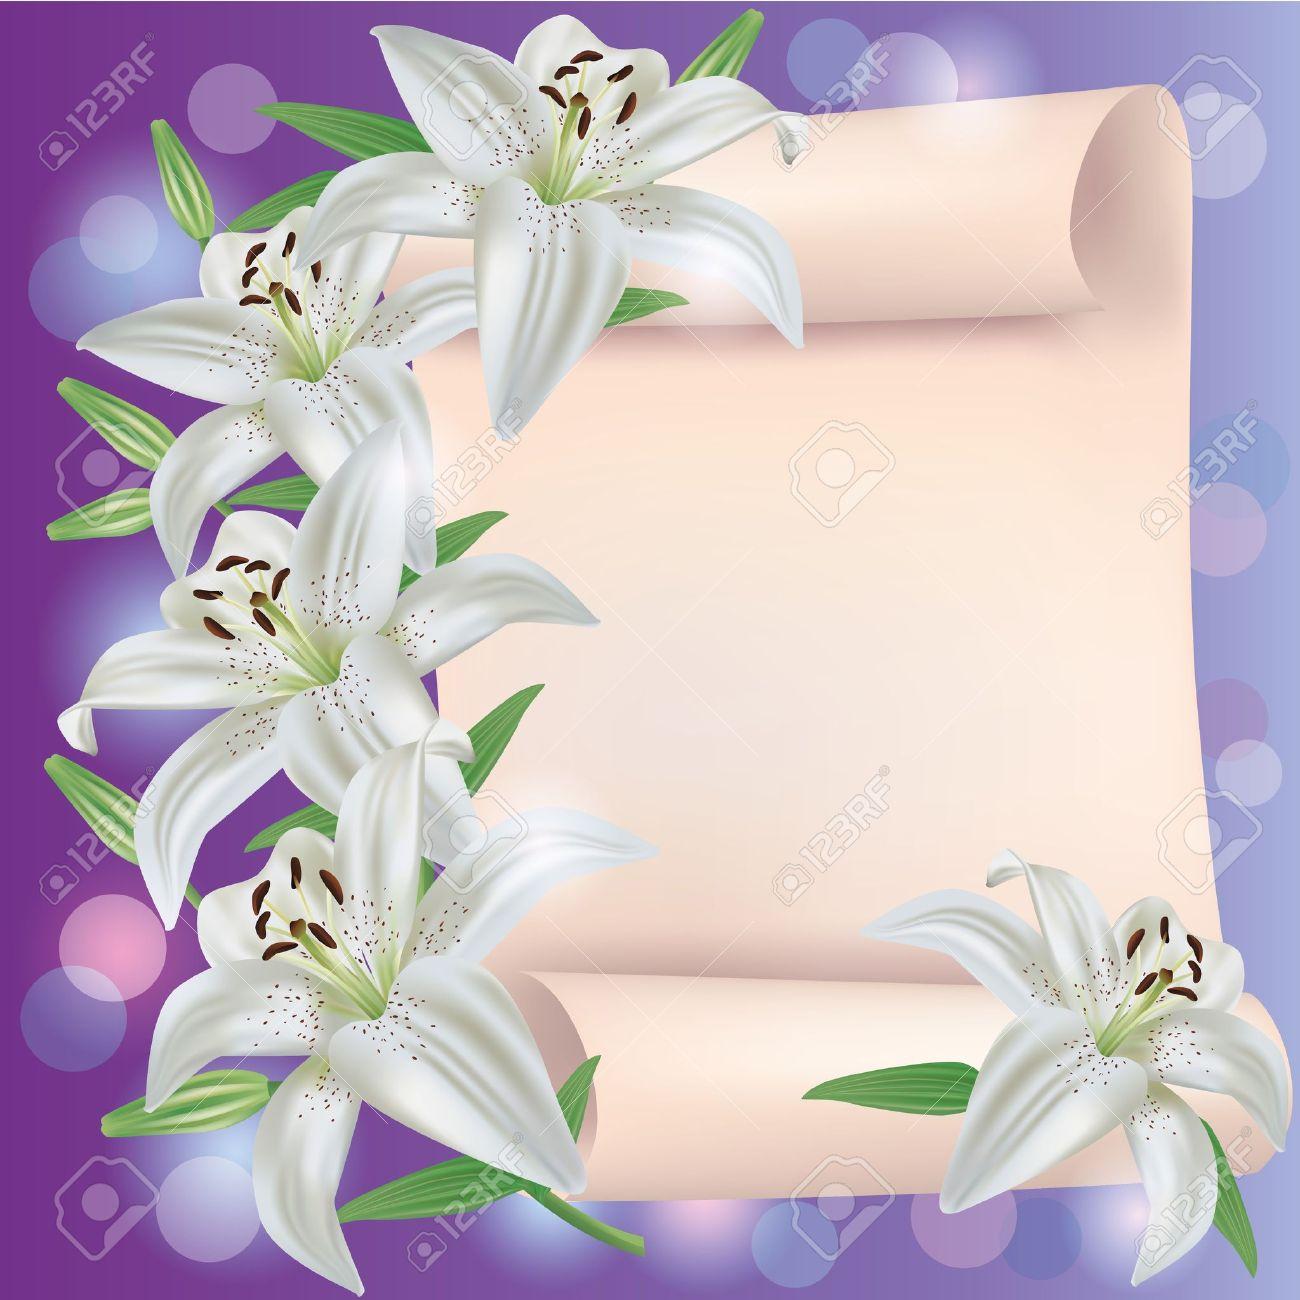 Greeting or invitation card with white lily flowers and paper greeting or invitation card with white lily flowers and paper sheet place for text stock stopboris Choice Image